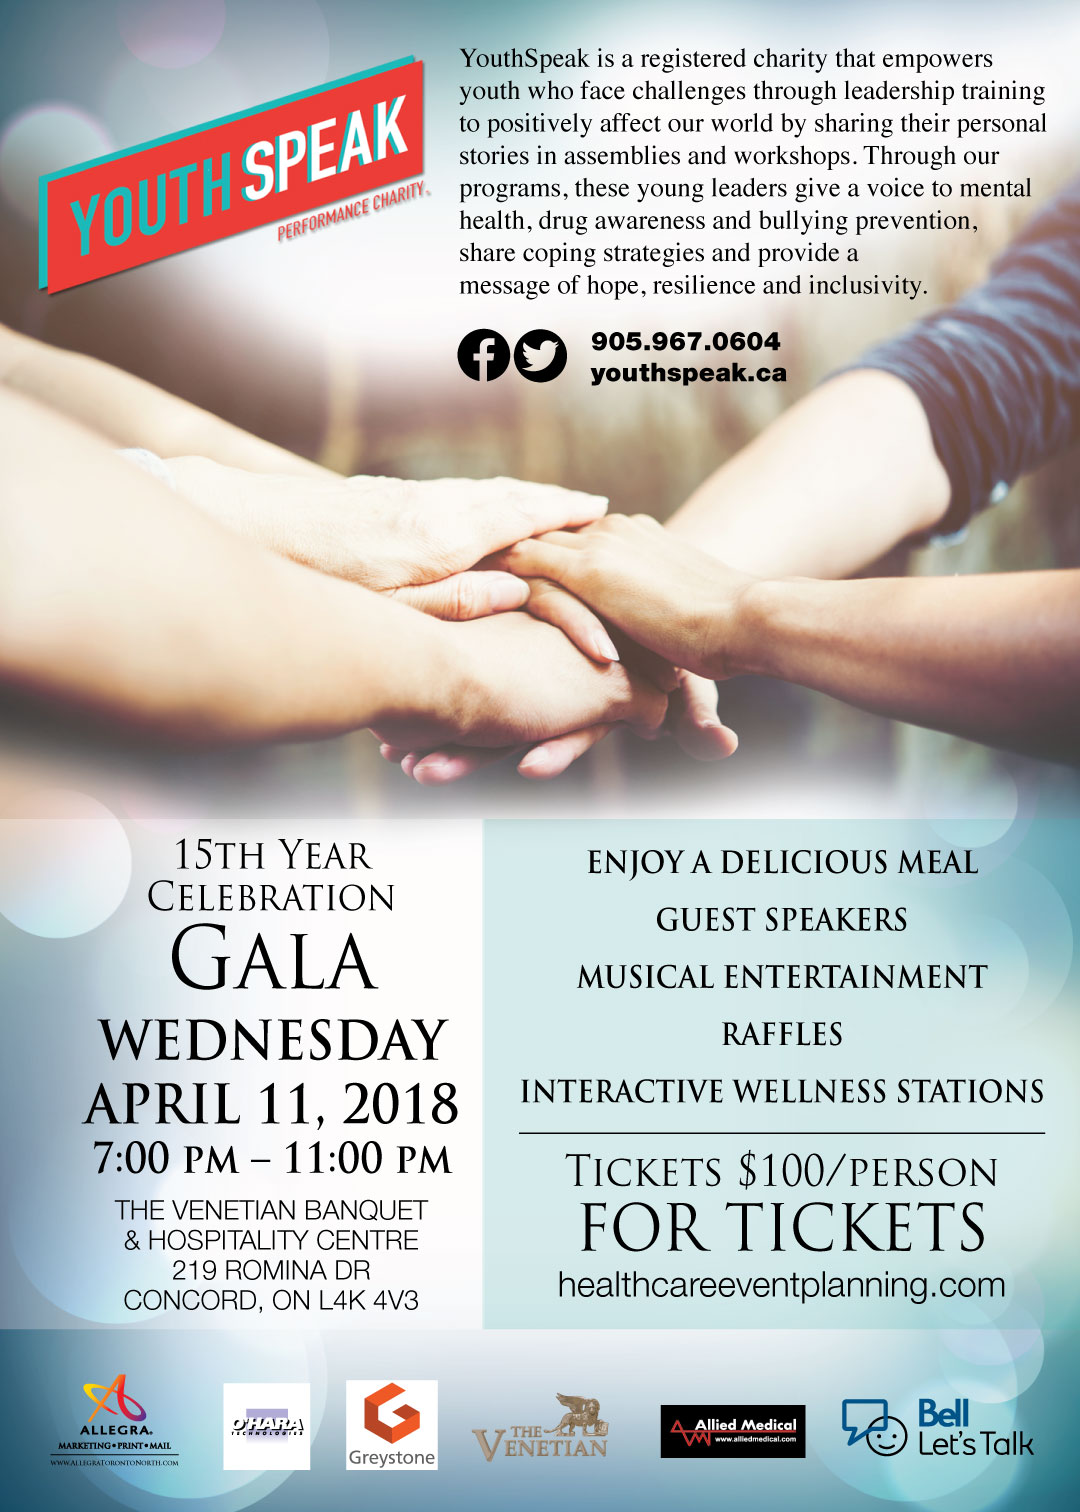 YouthSpeak Performance Charity  –  15th Year Celebration Gala